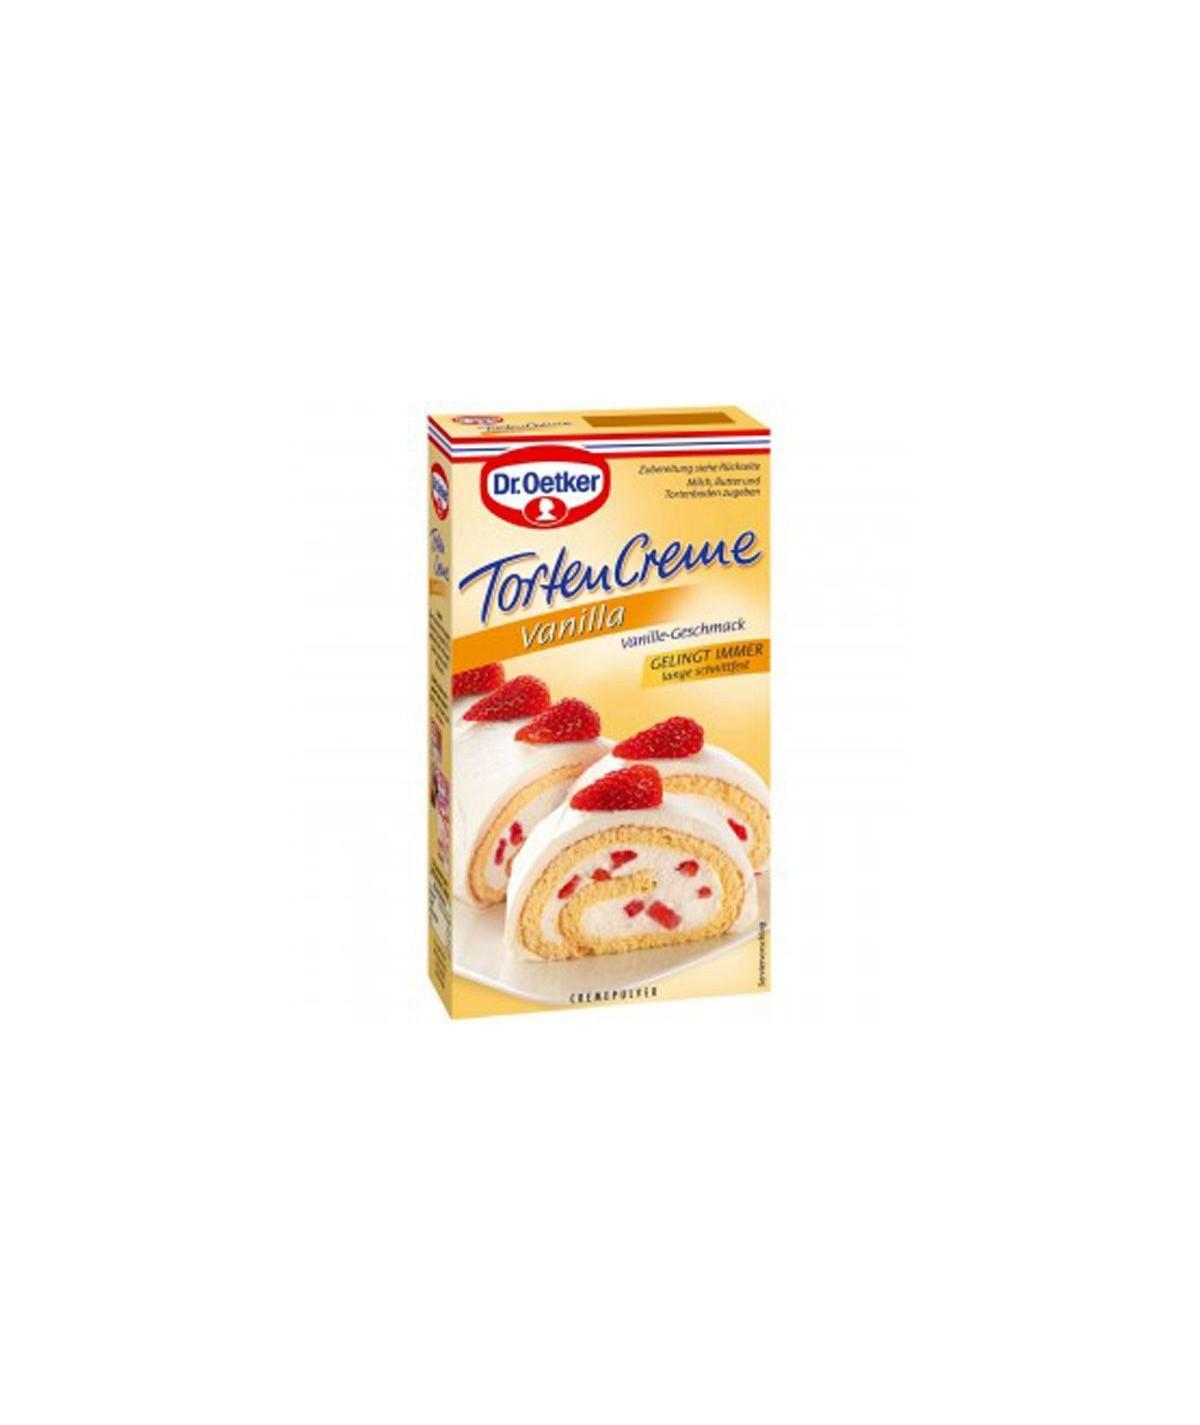 Tortencreme Cremepulver Vanilla Dr. Oetker 140g